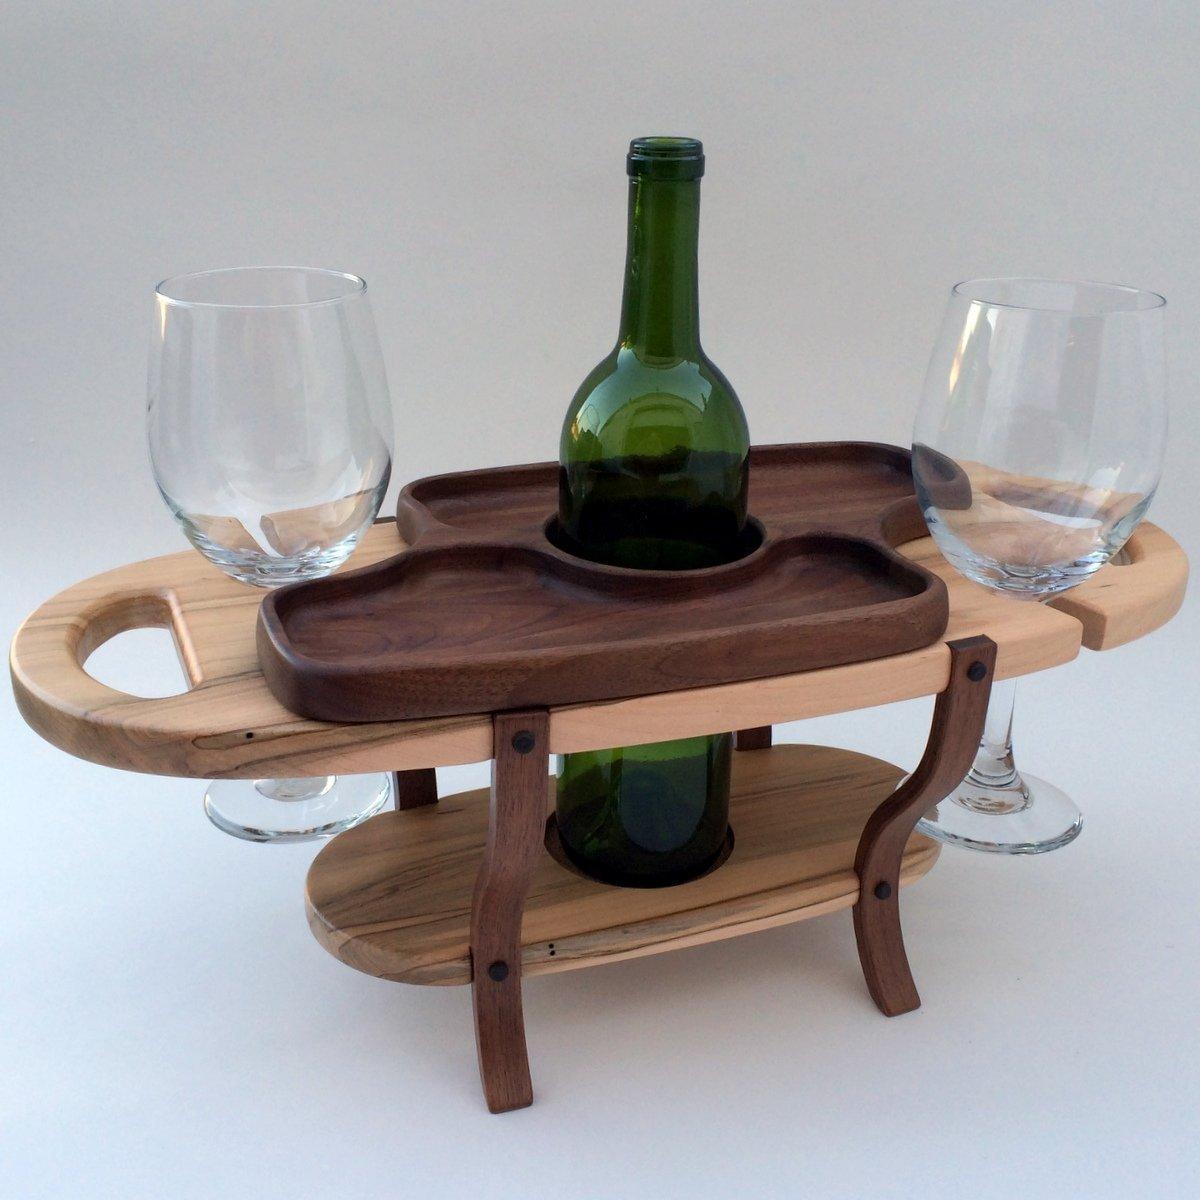 Amazoncom Handmade Wood Wine Caddy Tabletop Wine Bottle Rack